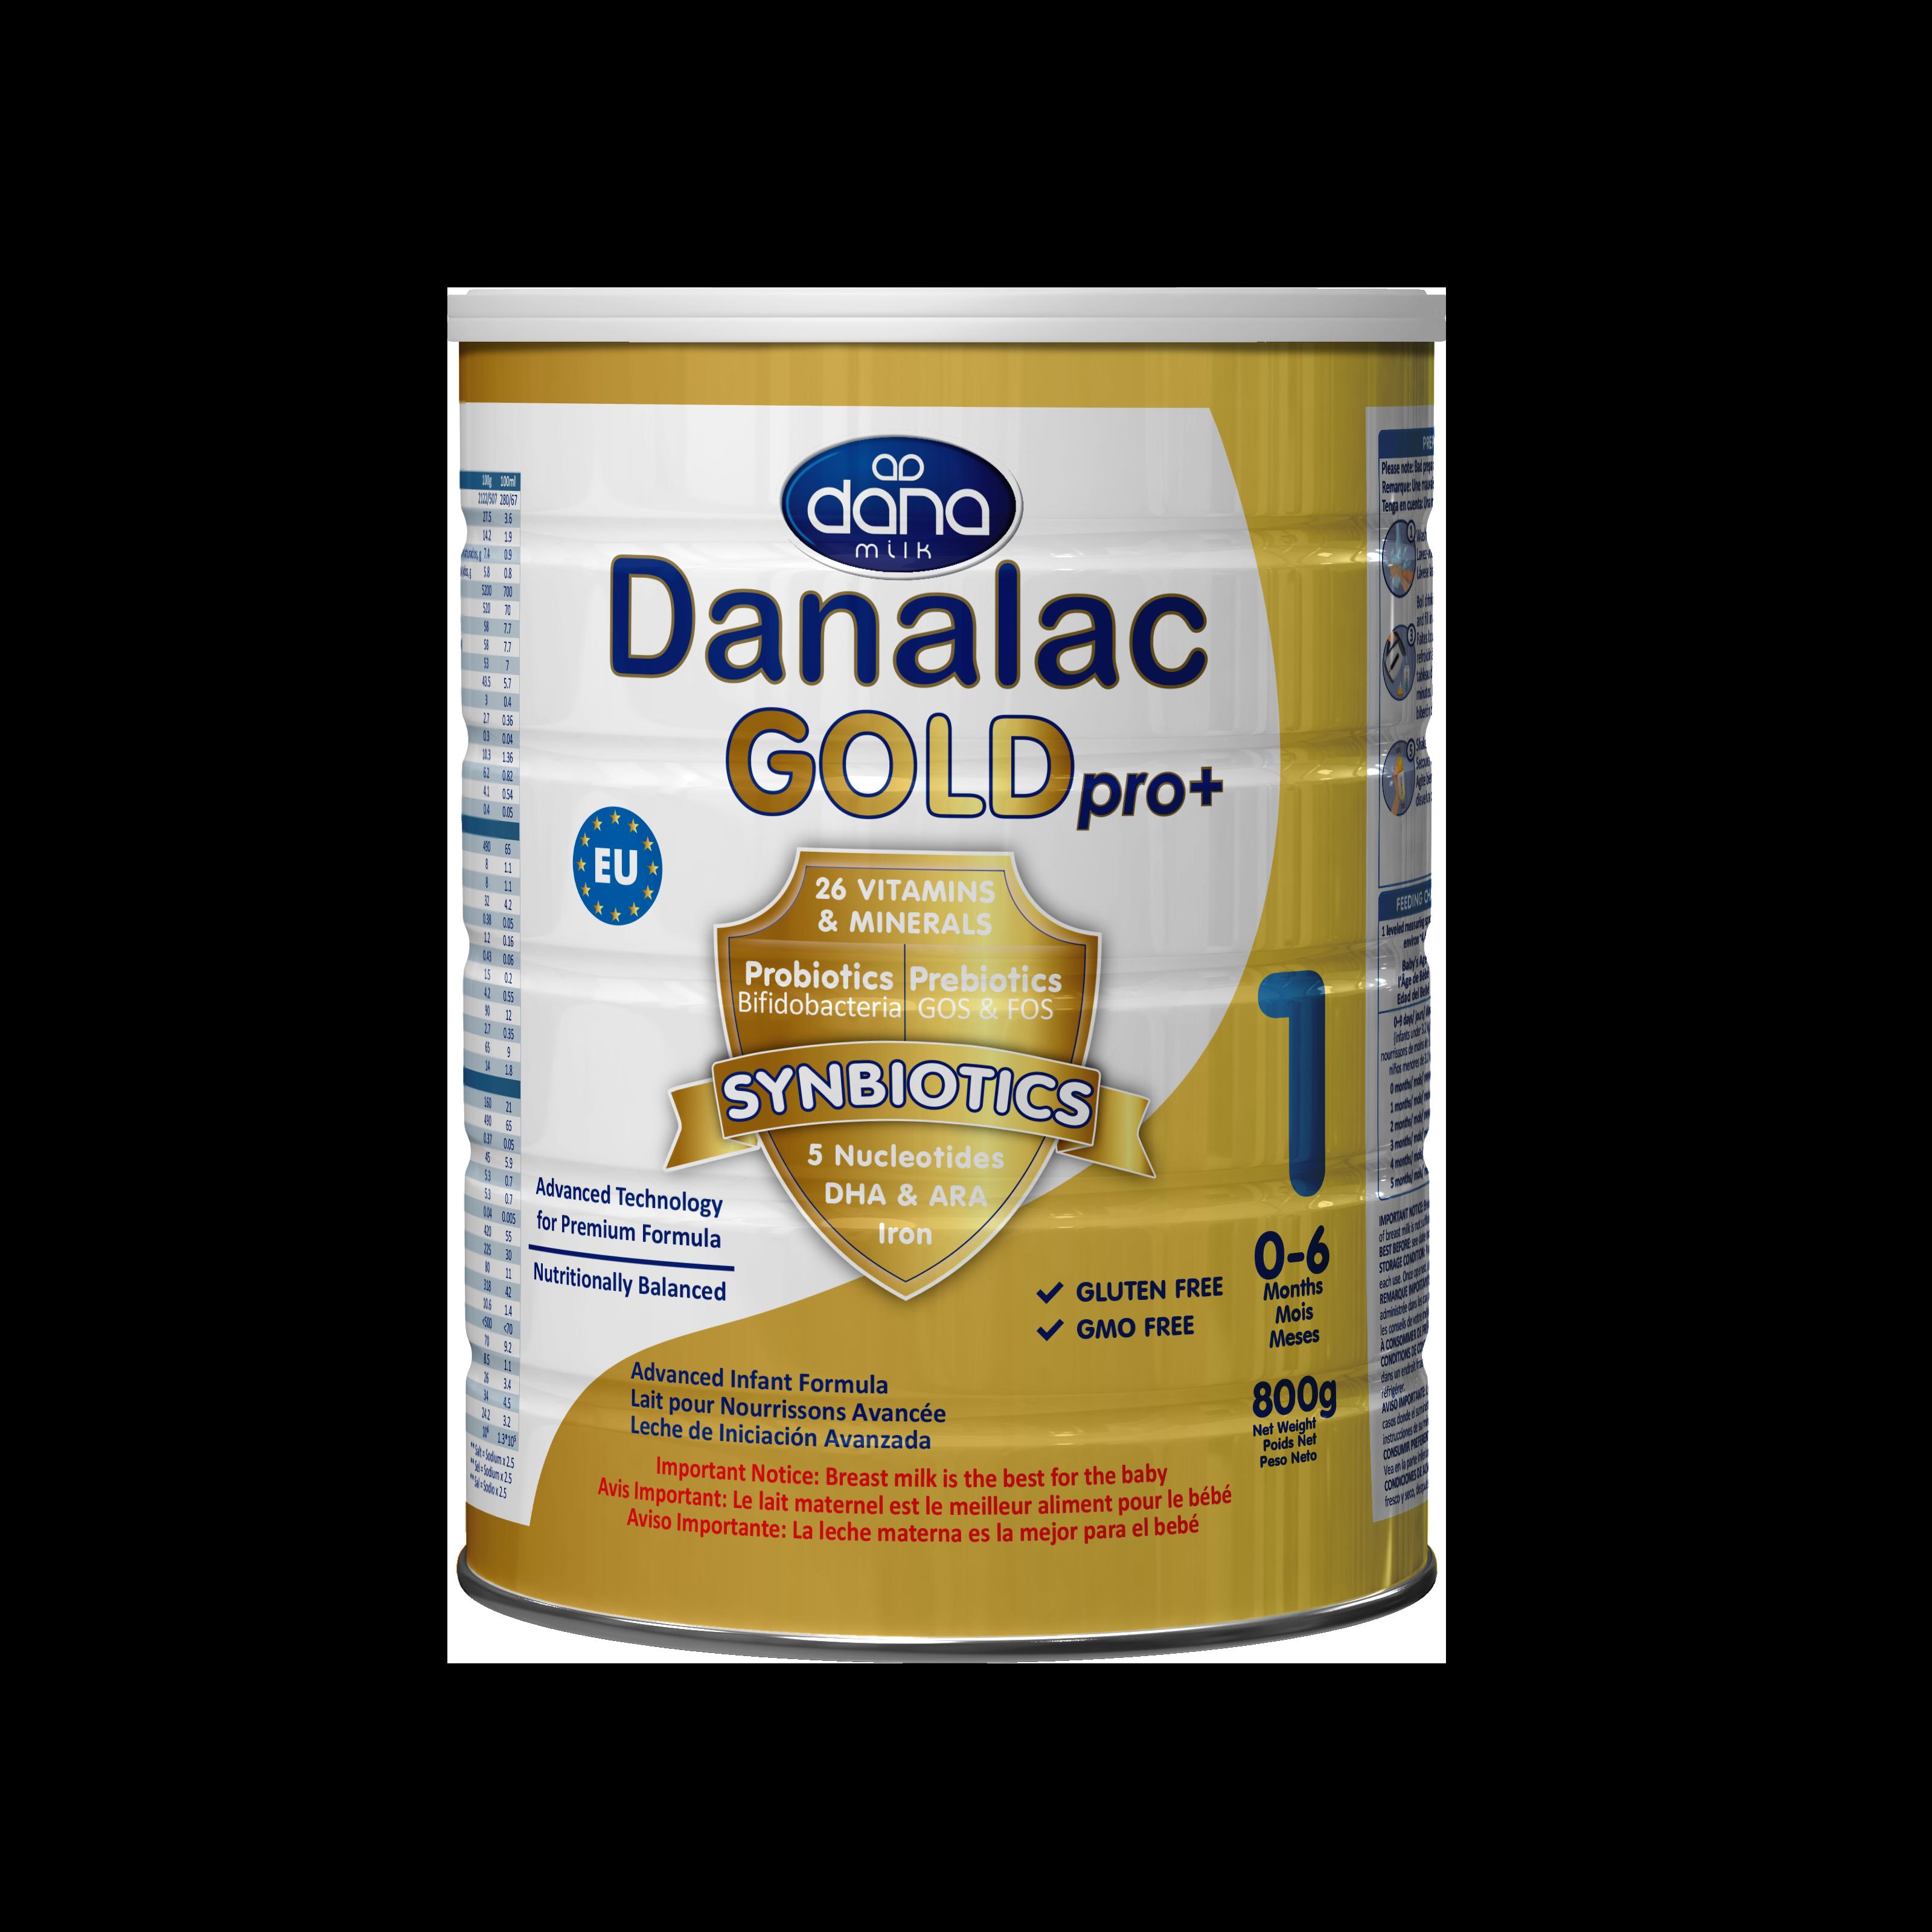 DANALAC-GOLD-bebe advance Formula-DHA-ARA-FOS-GOS-Tin